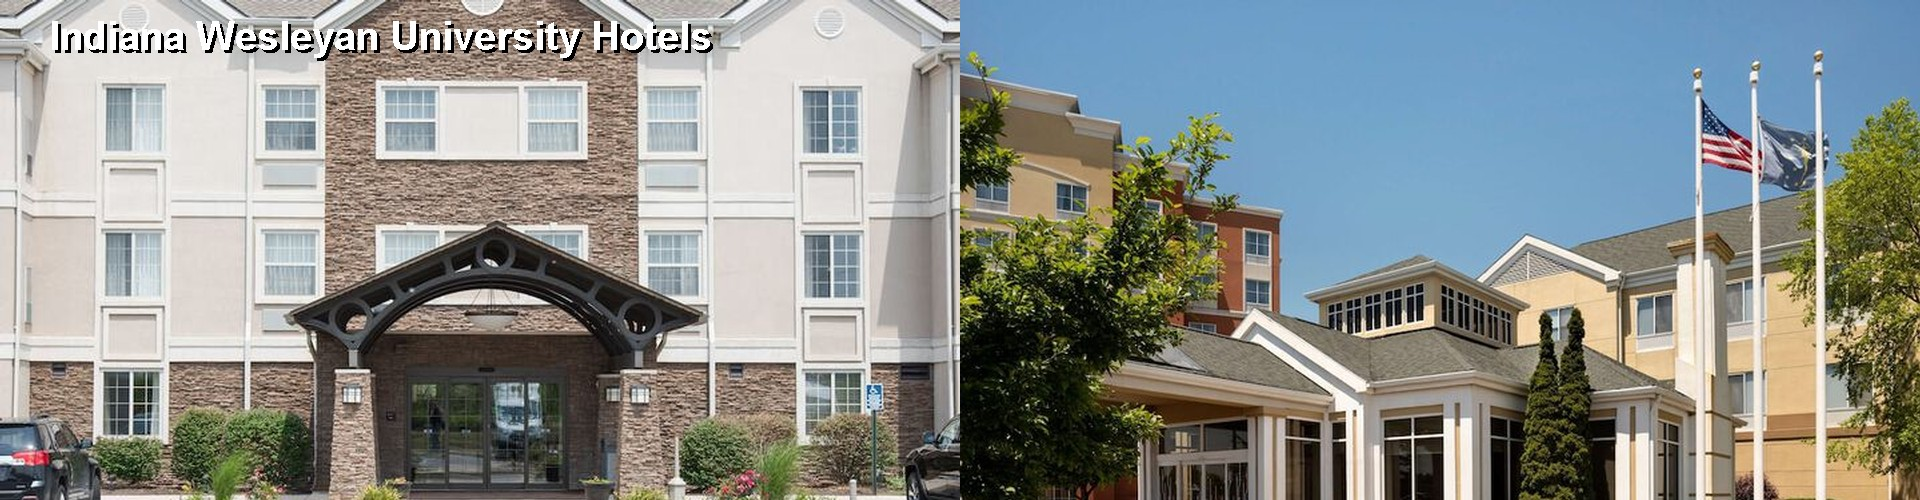 5 Best Hotels Near Indiana Wesleyan University